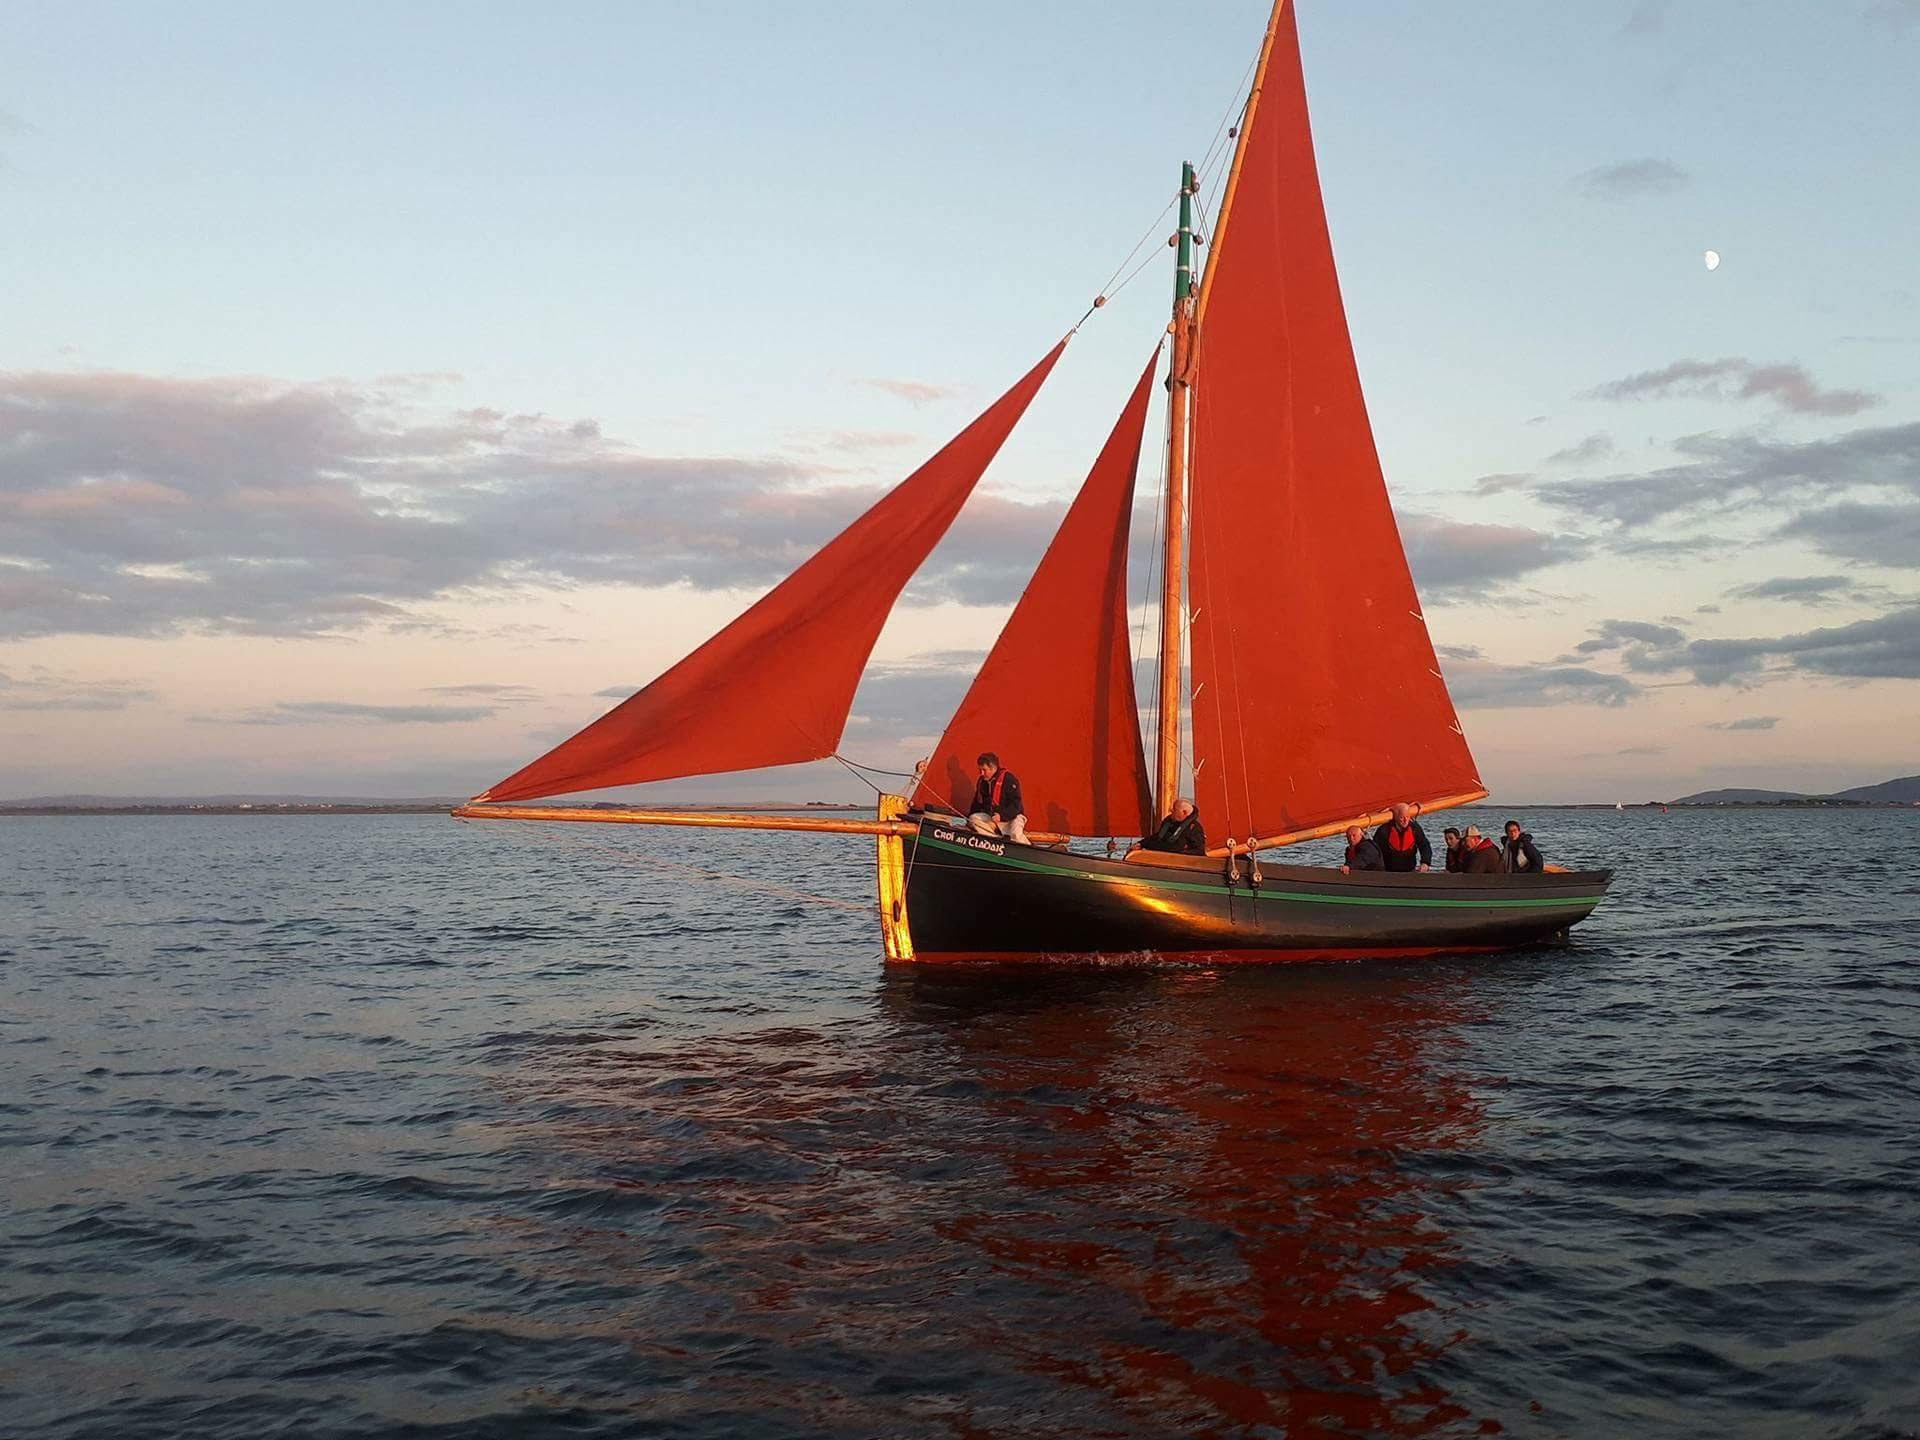 Galway Bay Boat Tours Sailing - Visit Galway